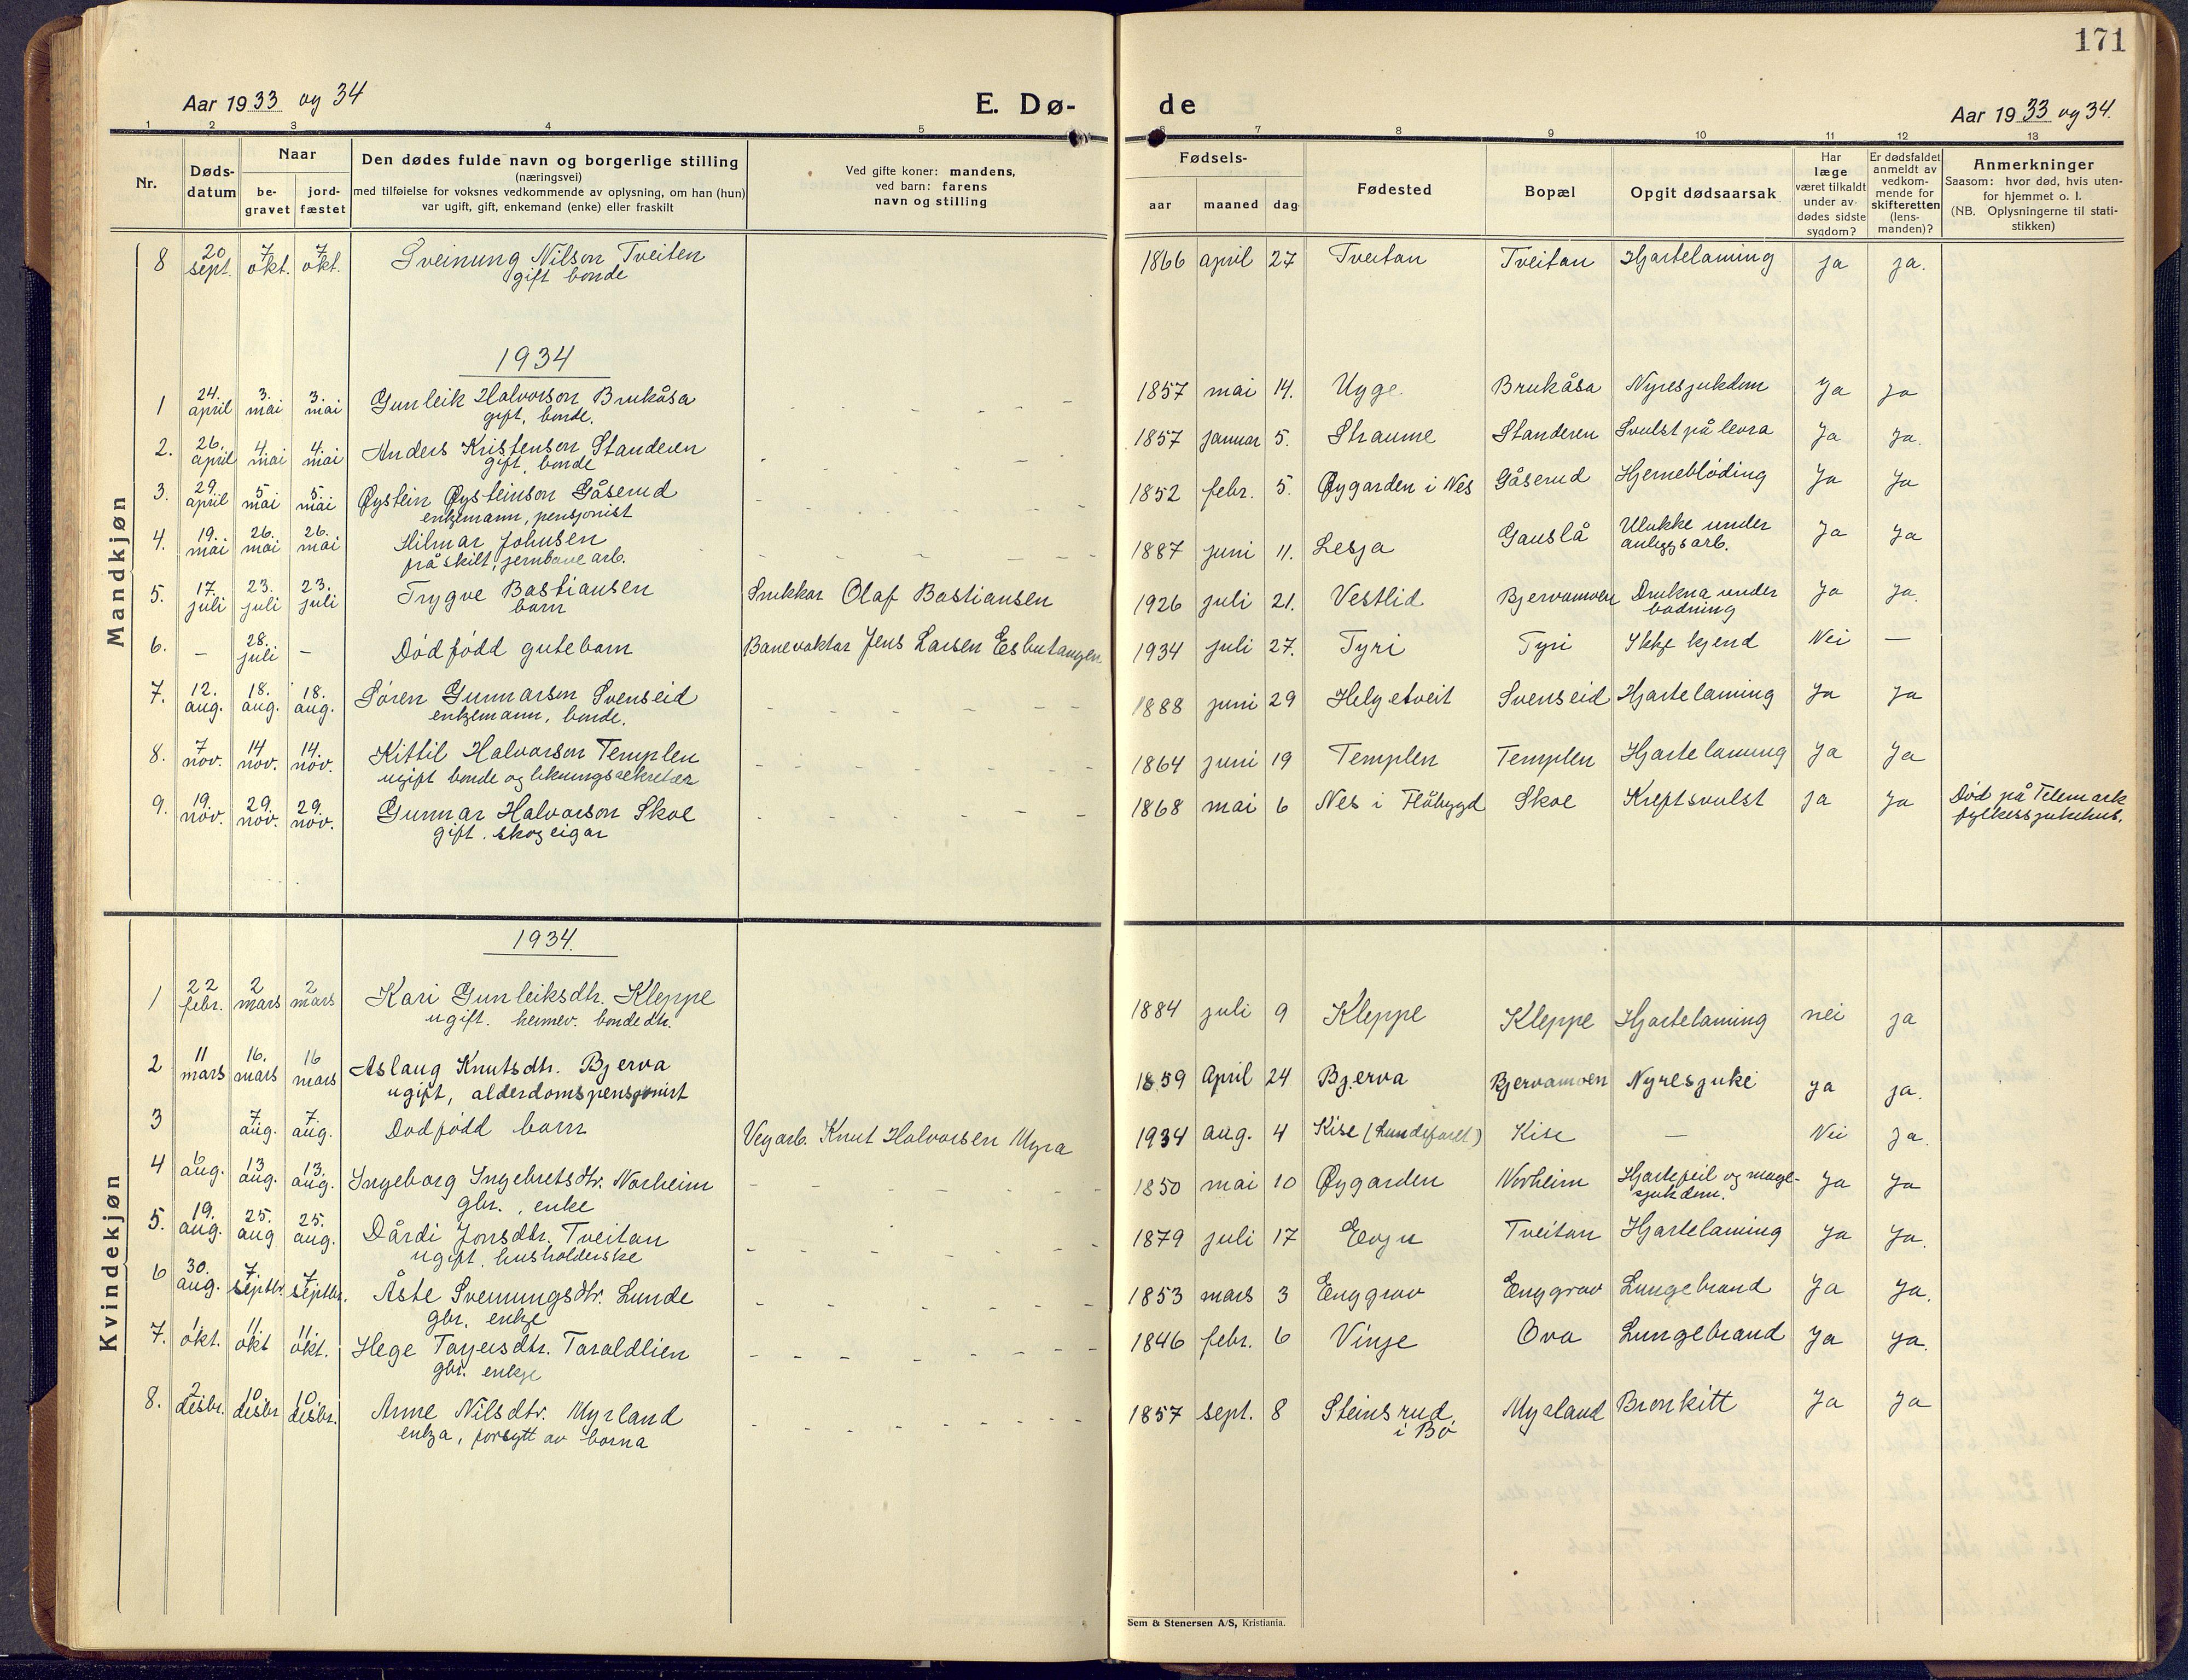 SAKO, Lunde kirkebøker, F/Fa/L0006: Ministerialbok nr. I 6, 1922-1940, s. 171